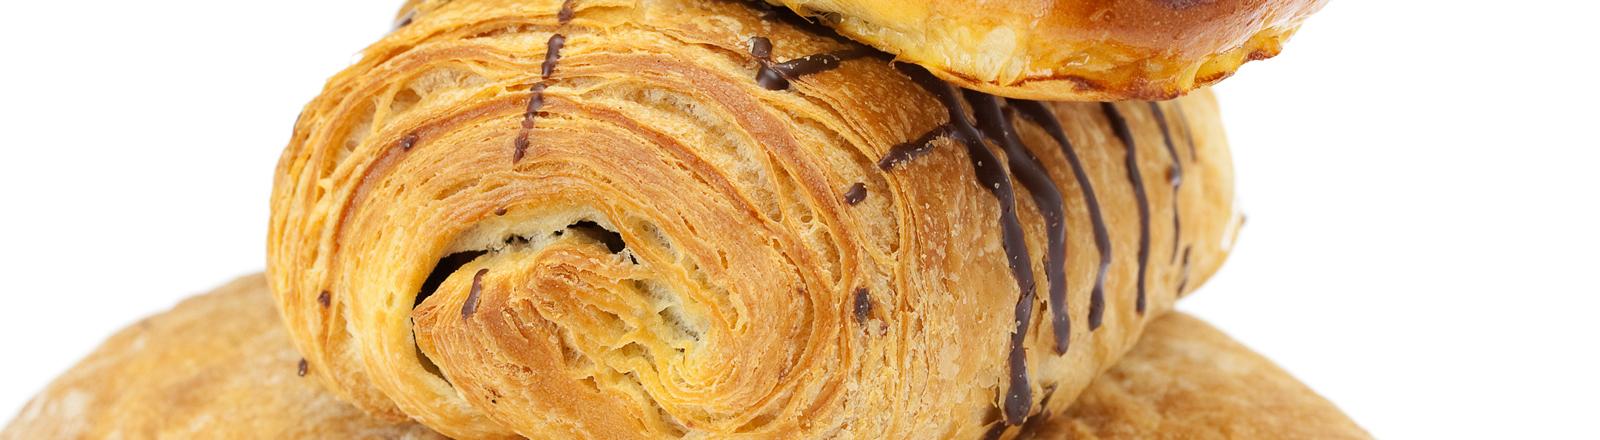 Schoko-Croissant